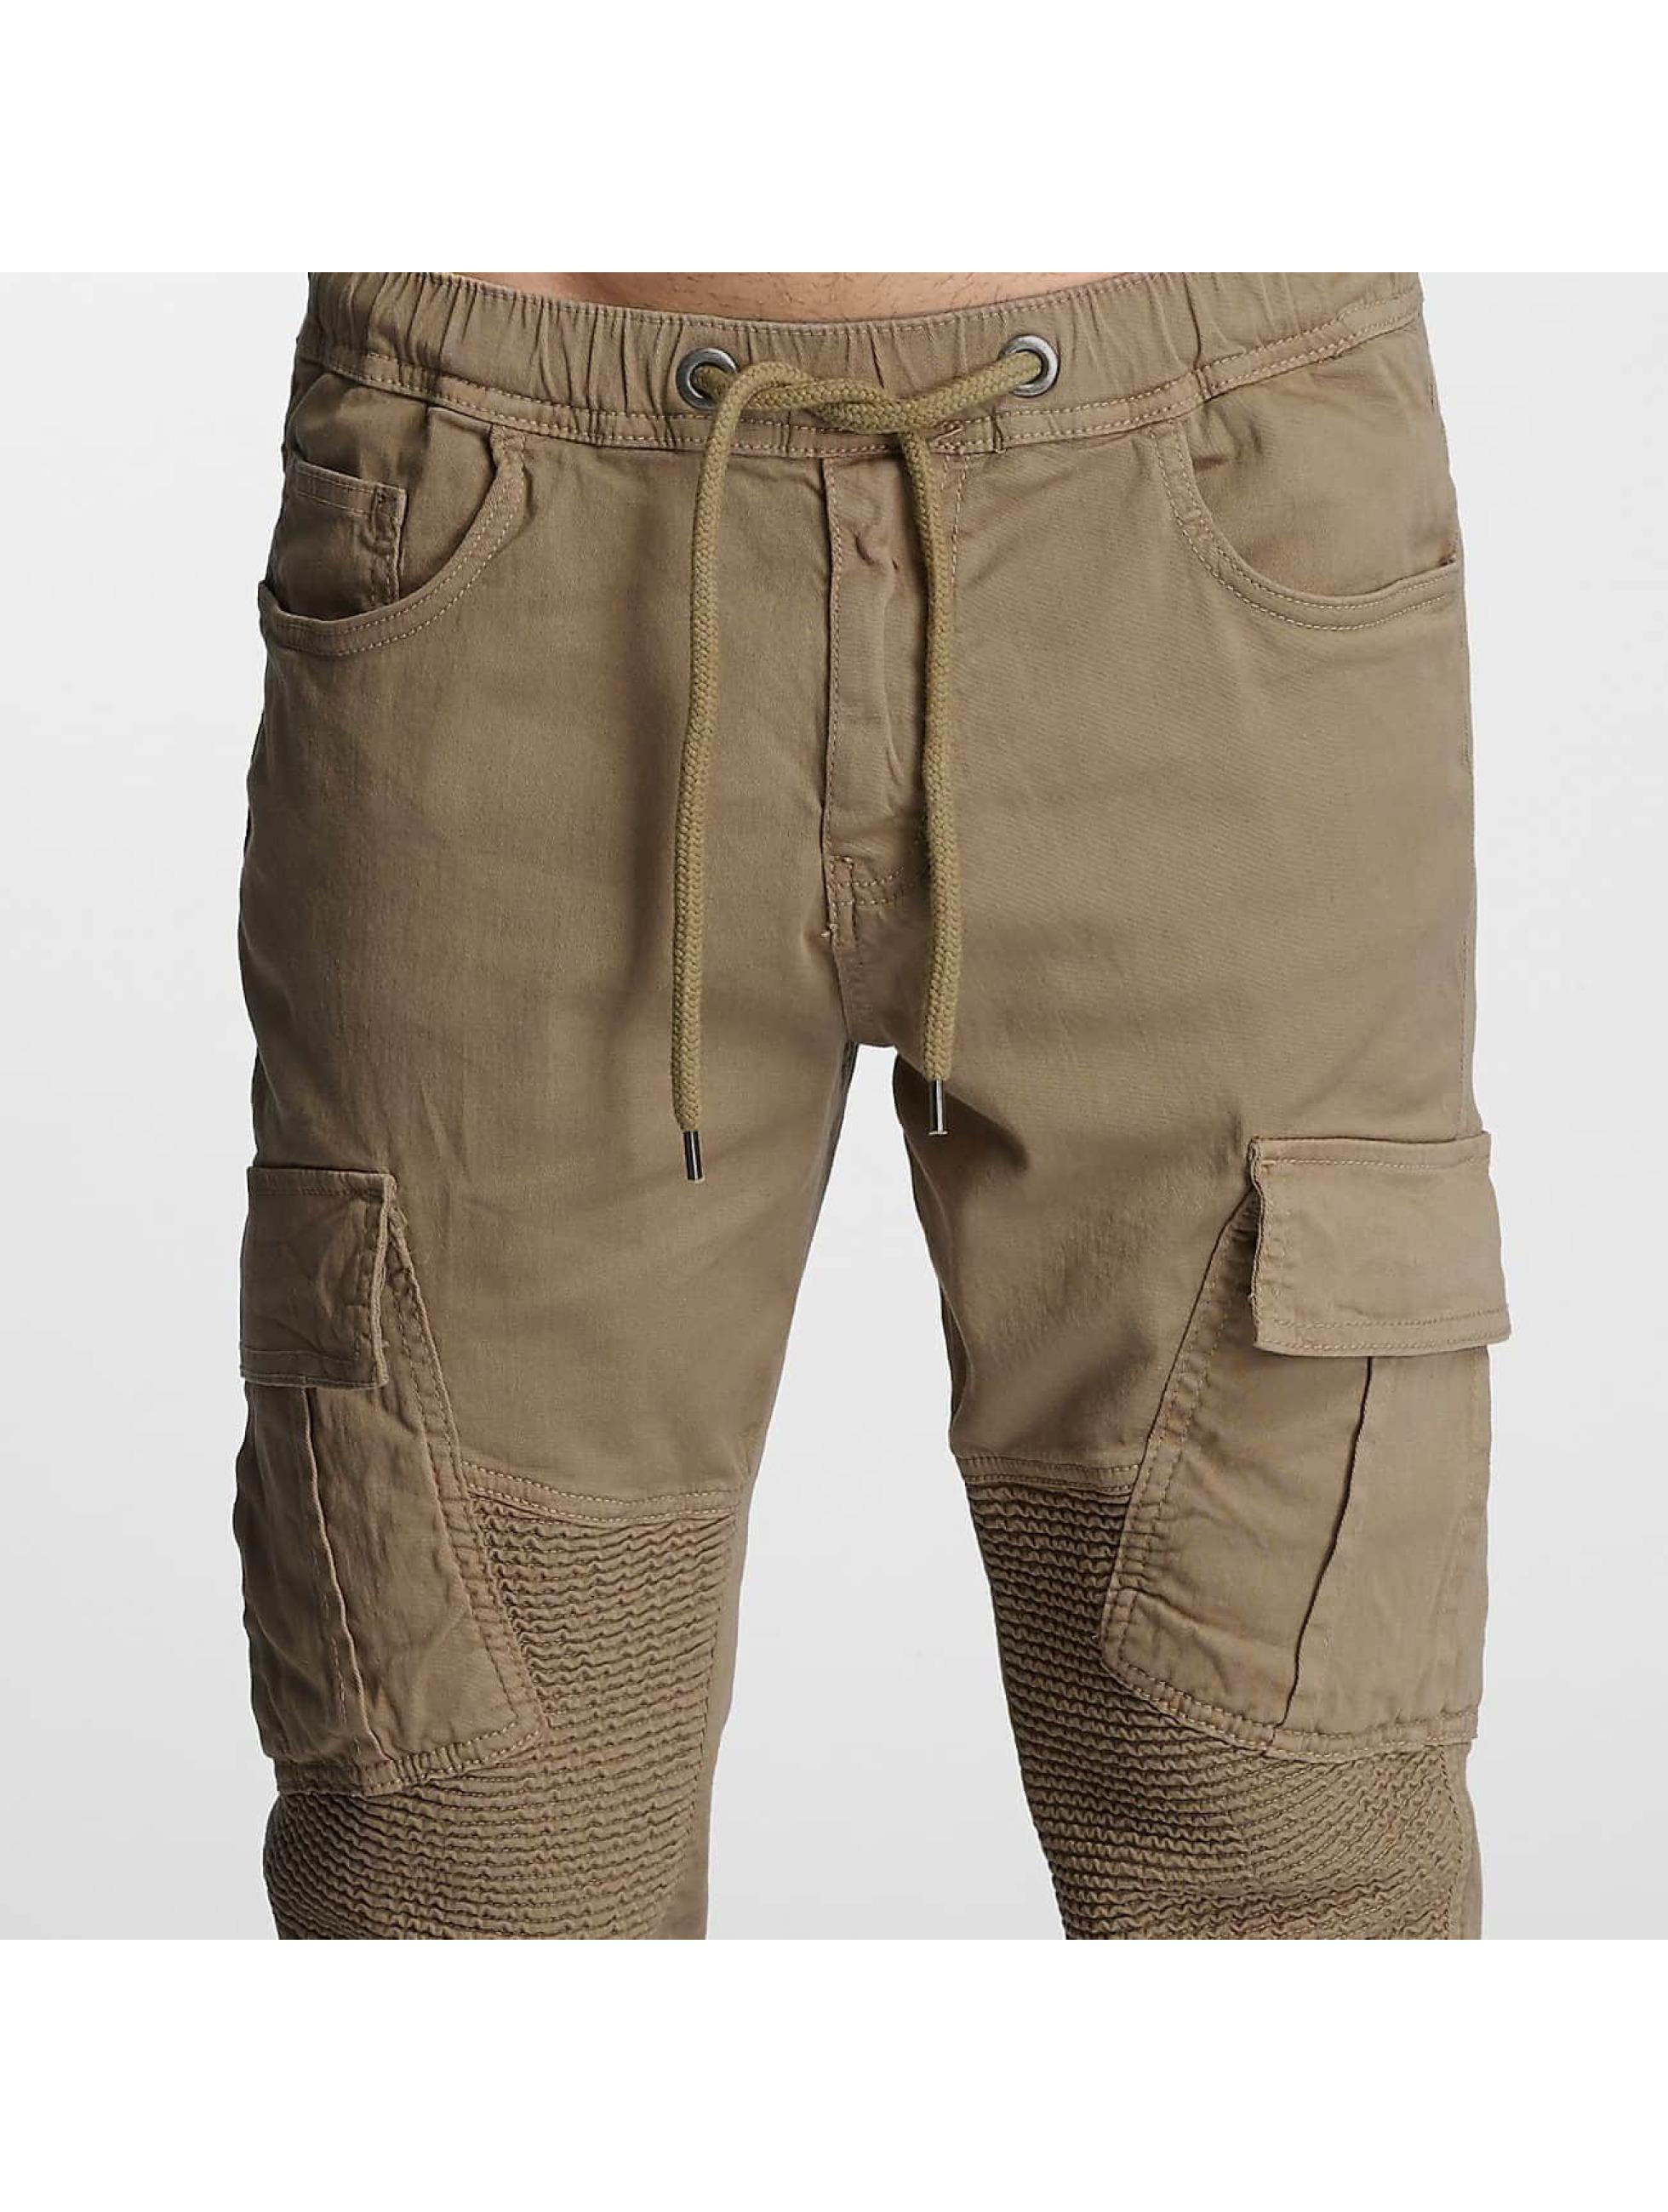 def cargo beige homme pantalon chino 341846. Black Bedroom Furniture Sets. Home Design Ideas